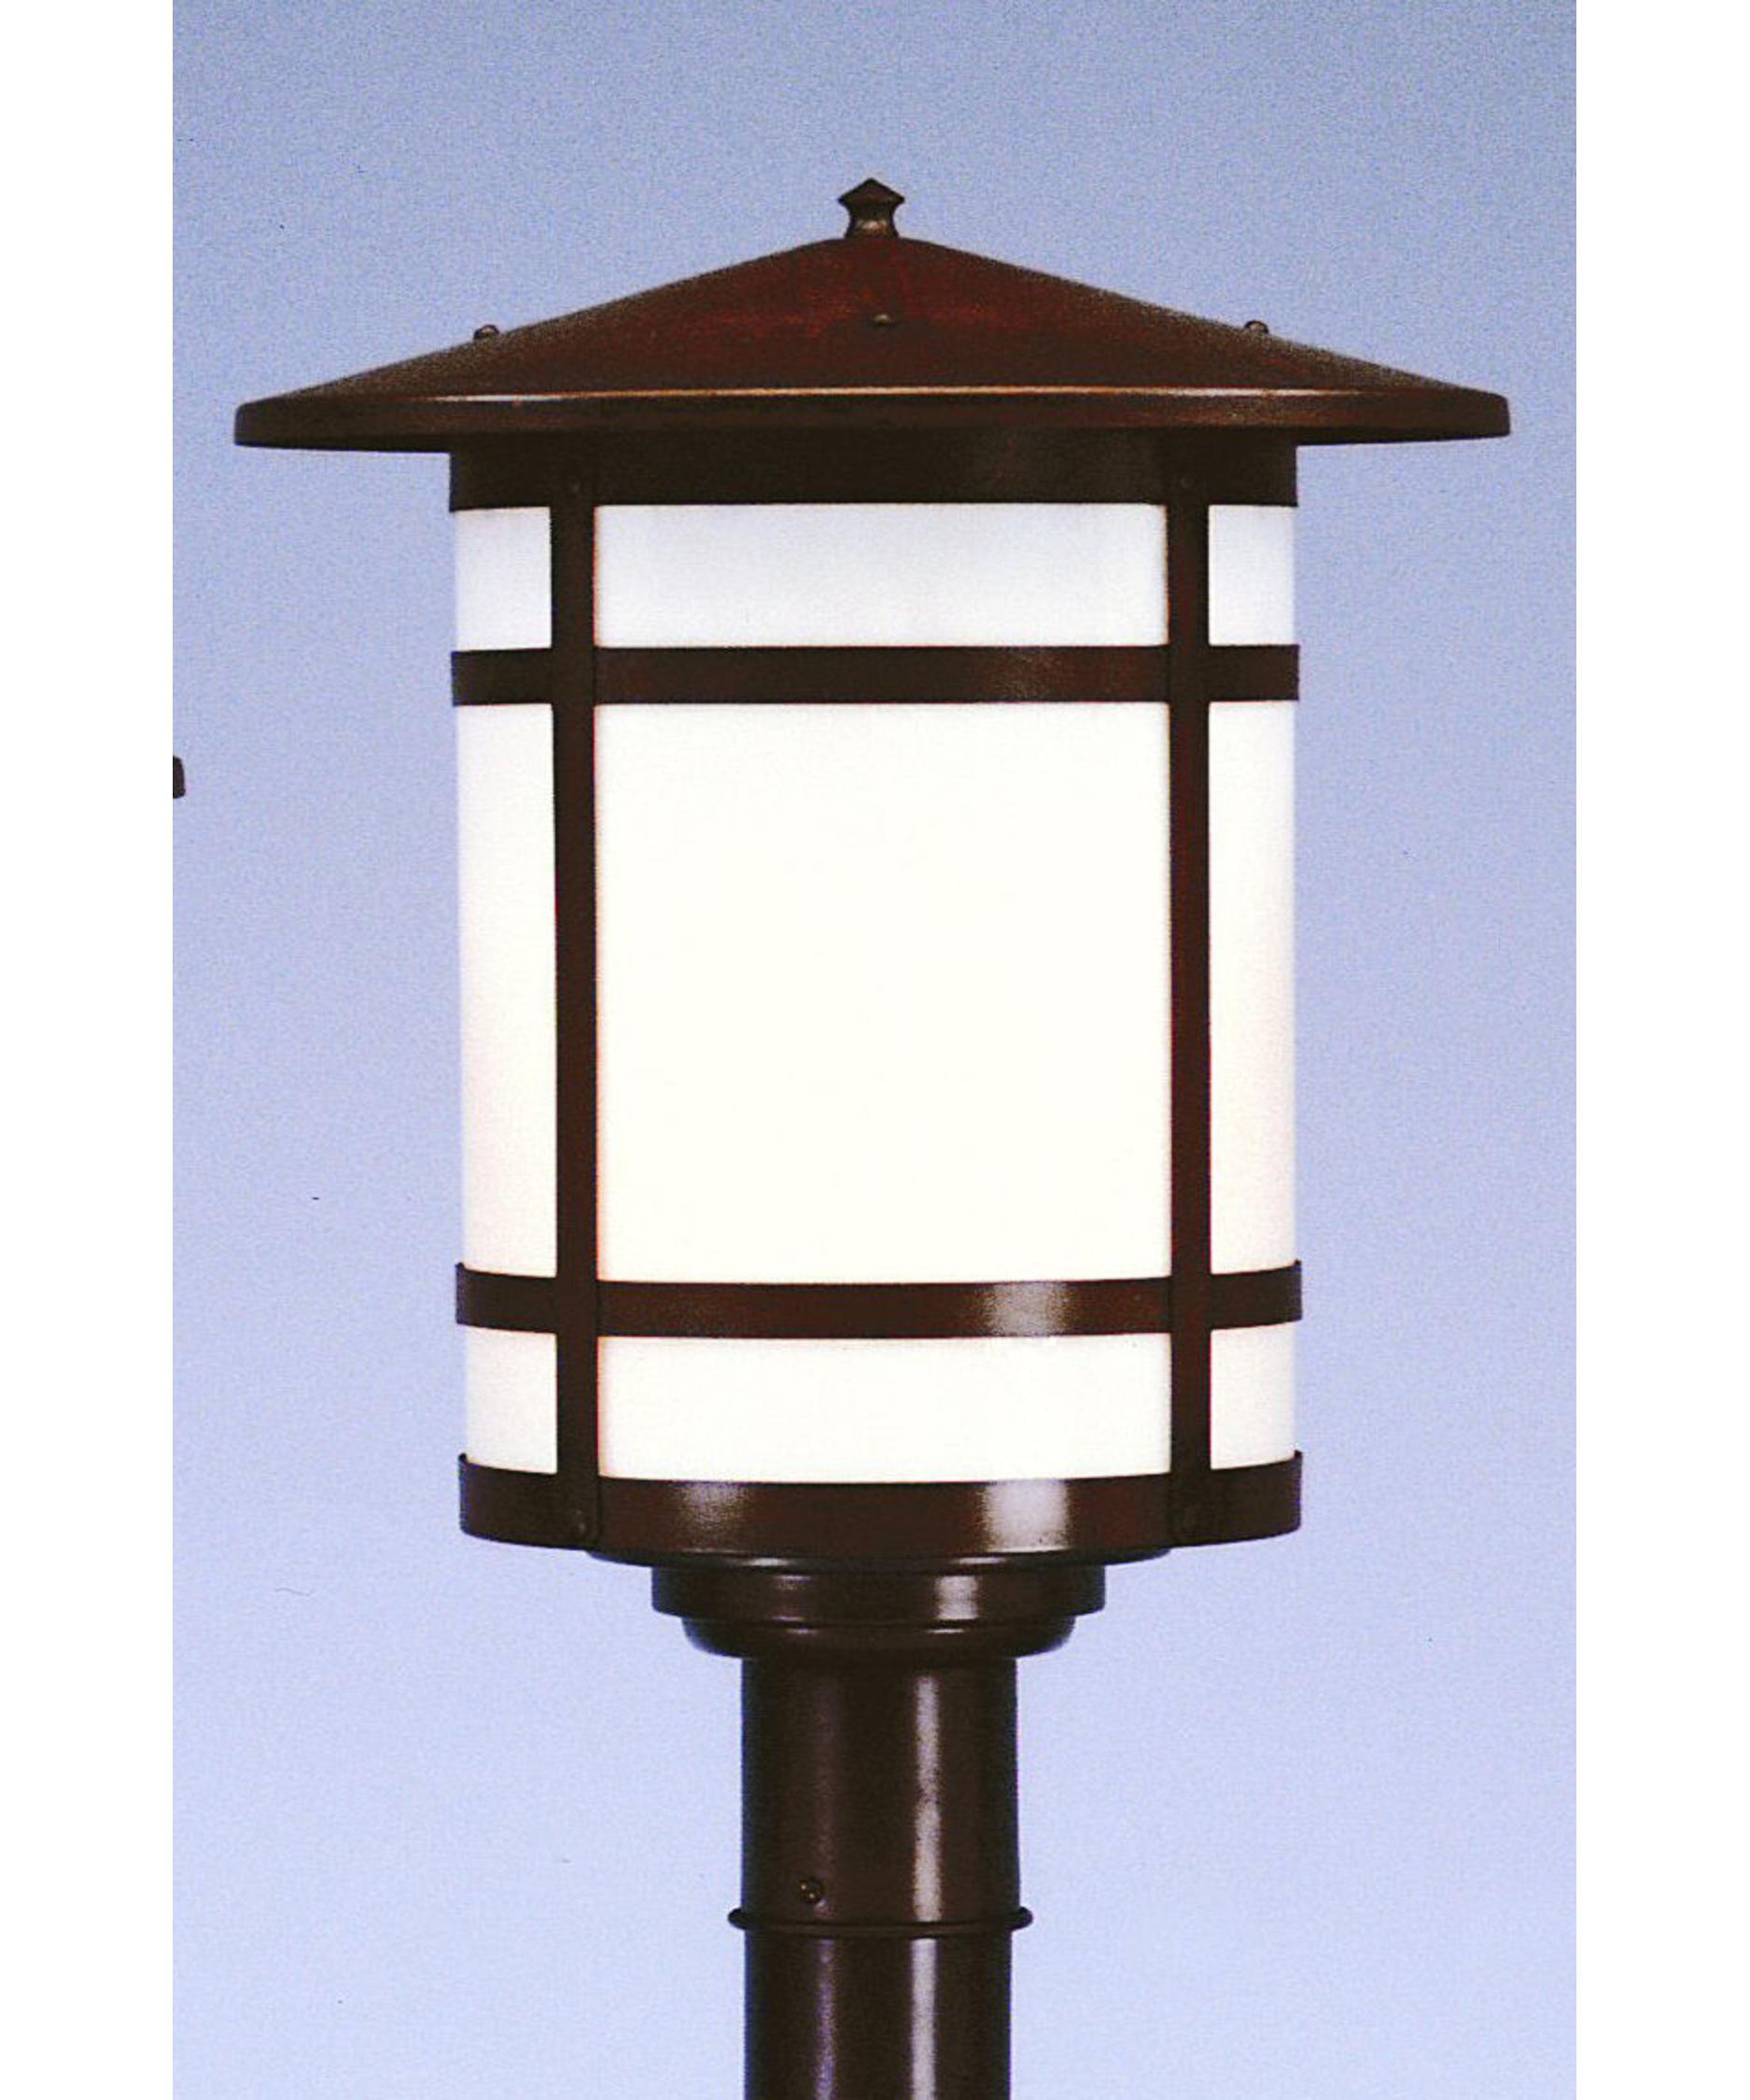 Landscape Lighting Gillette Nj: Arroyo Craftsman BP-14L Berkeley 1 Light Outdoor Post Lamp